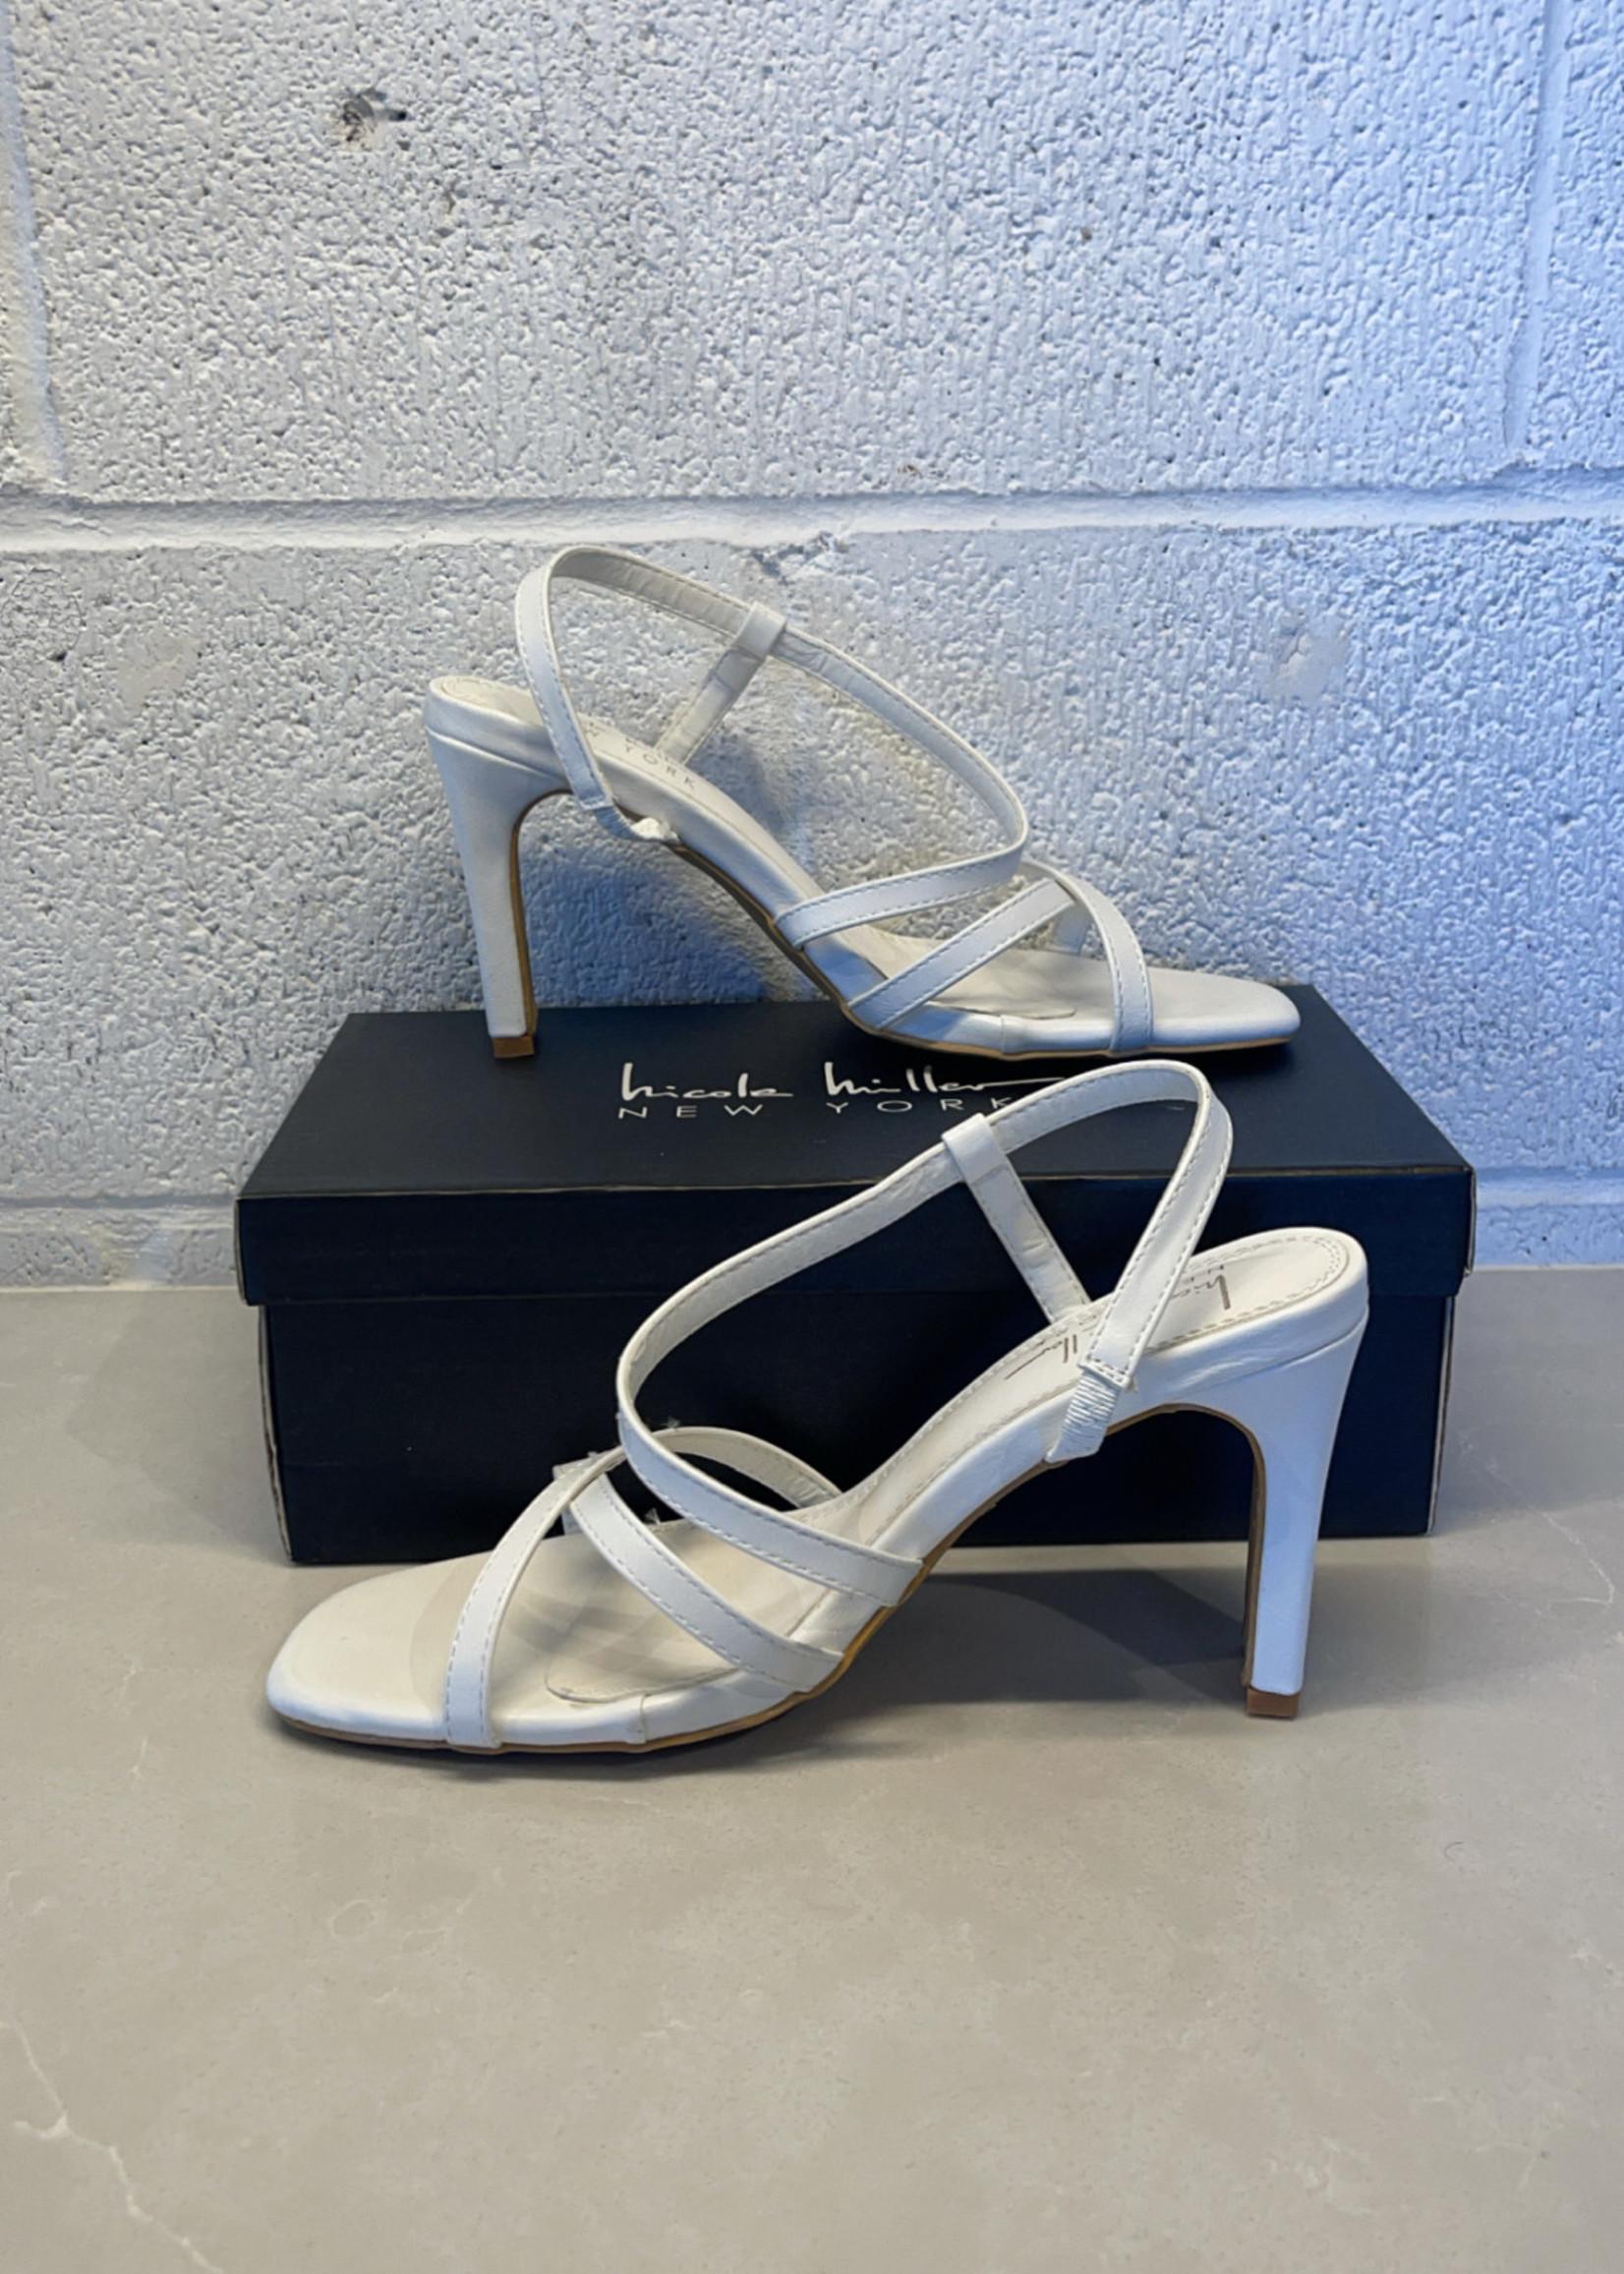 Nicole miller reima white strappy heels 7.5